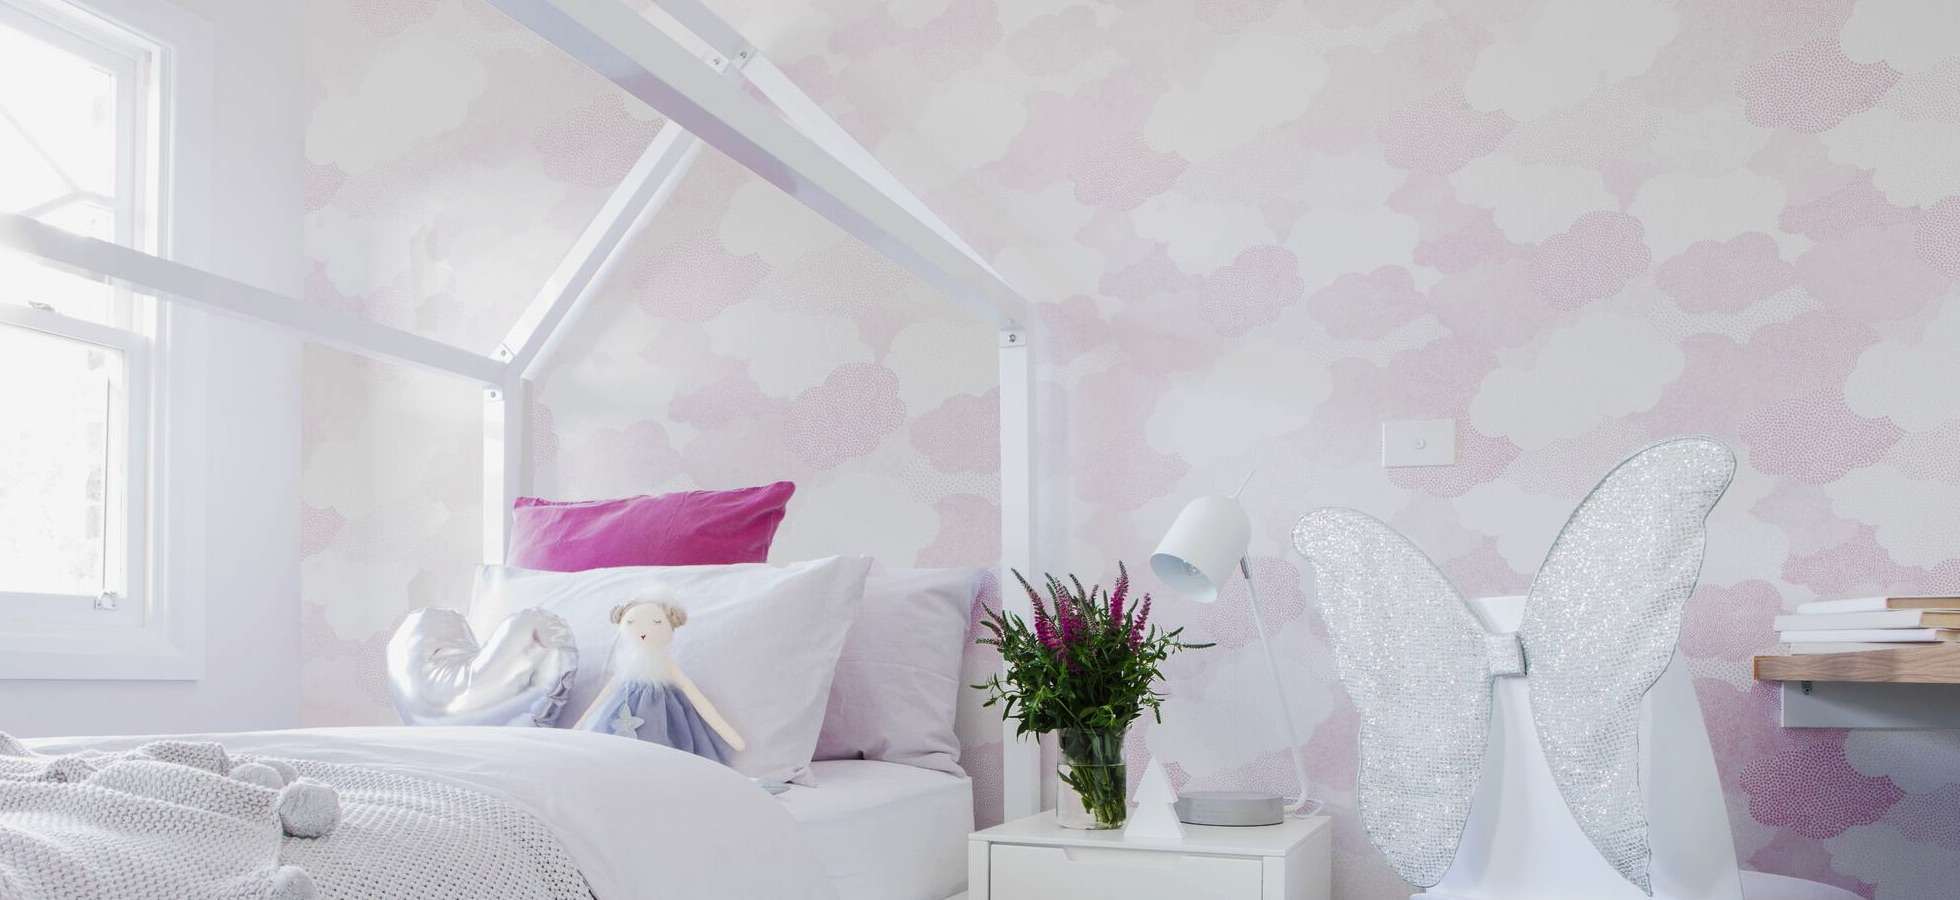 Must see Wallpaper Marble Hot Pink - clouds_main  HD_95238.jpg?t\u003d1527754540